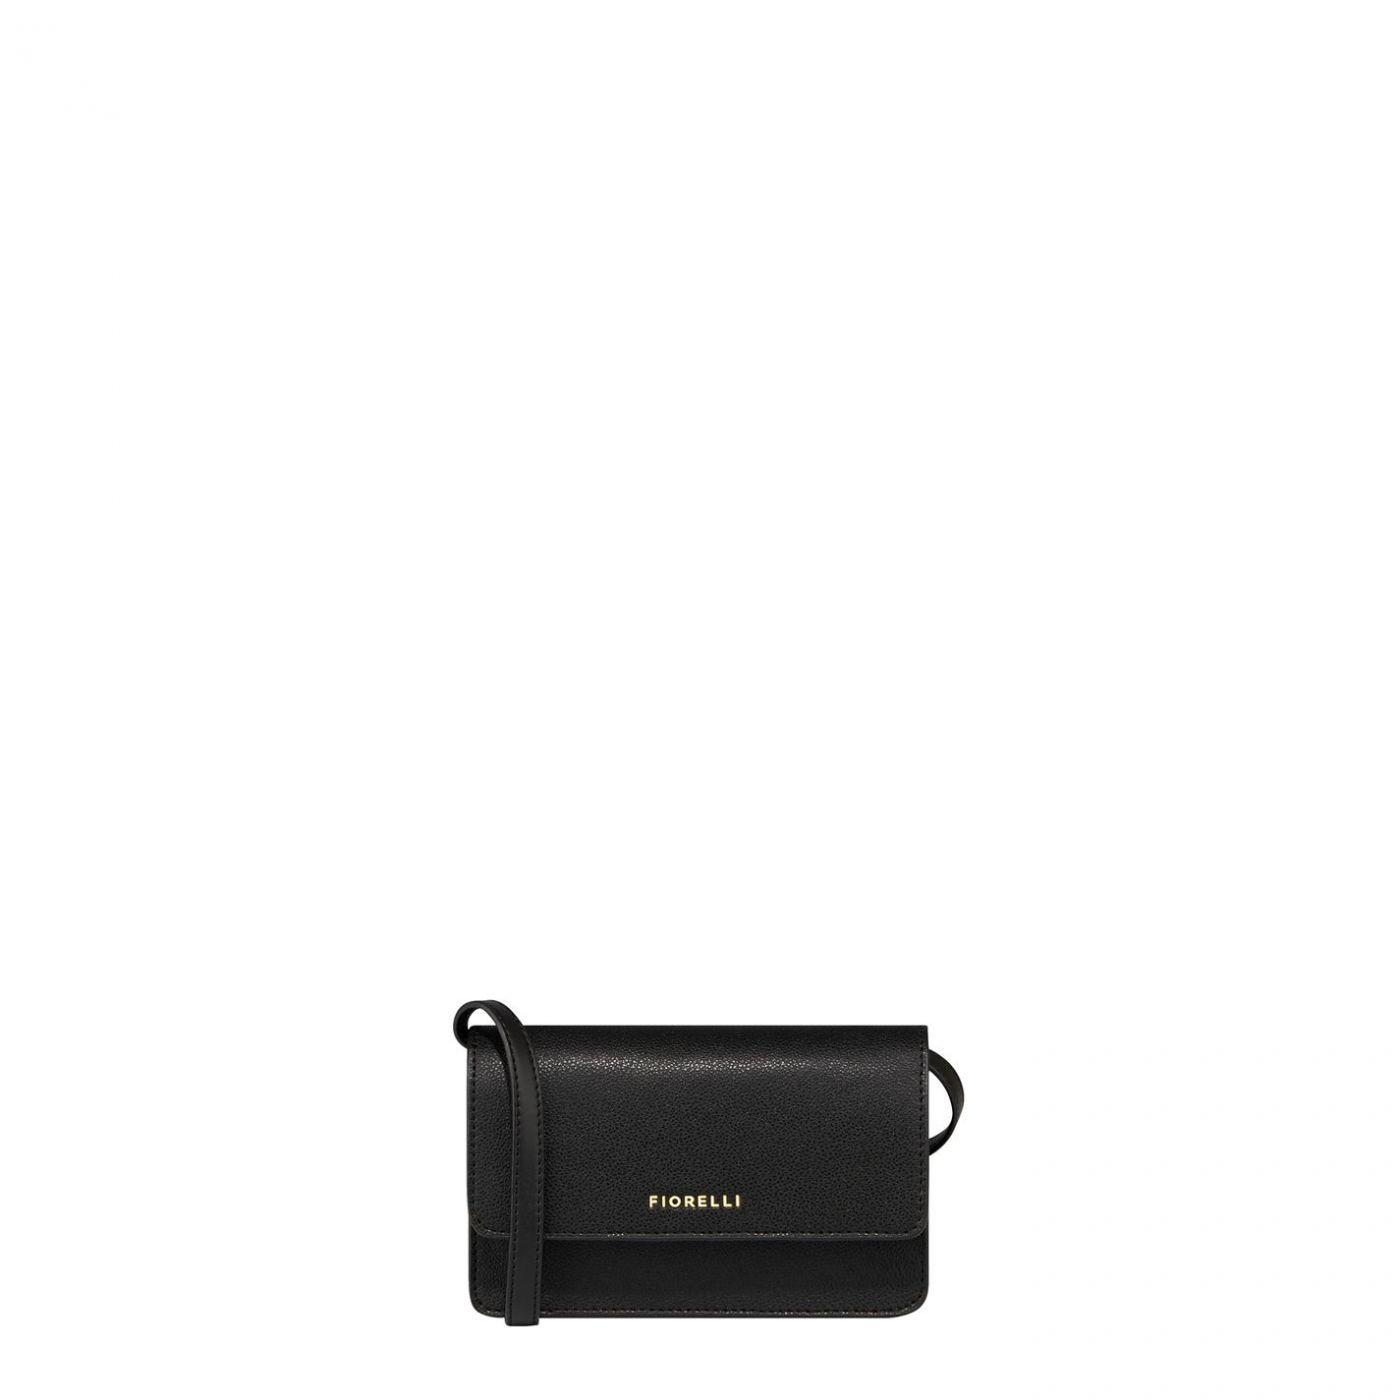 Fiorelli Millie Crossbody Bag